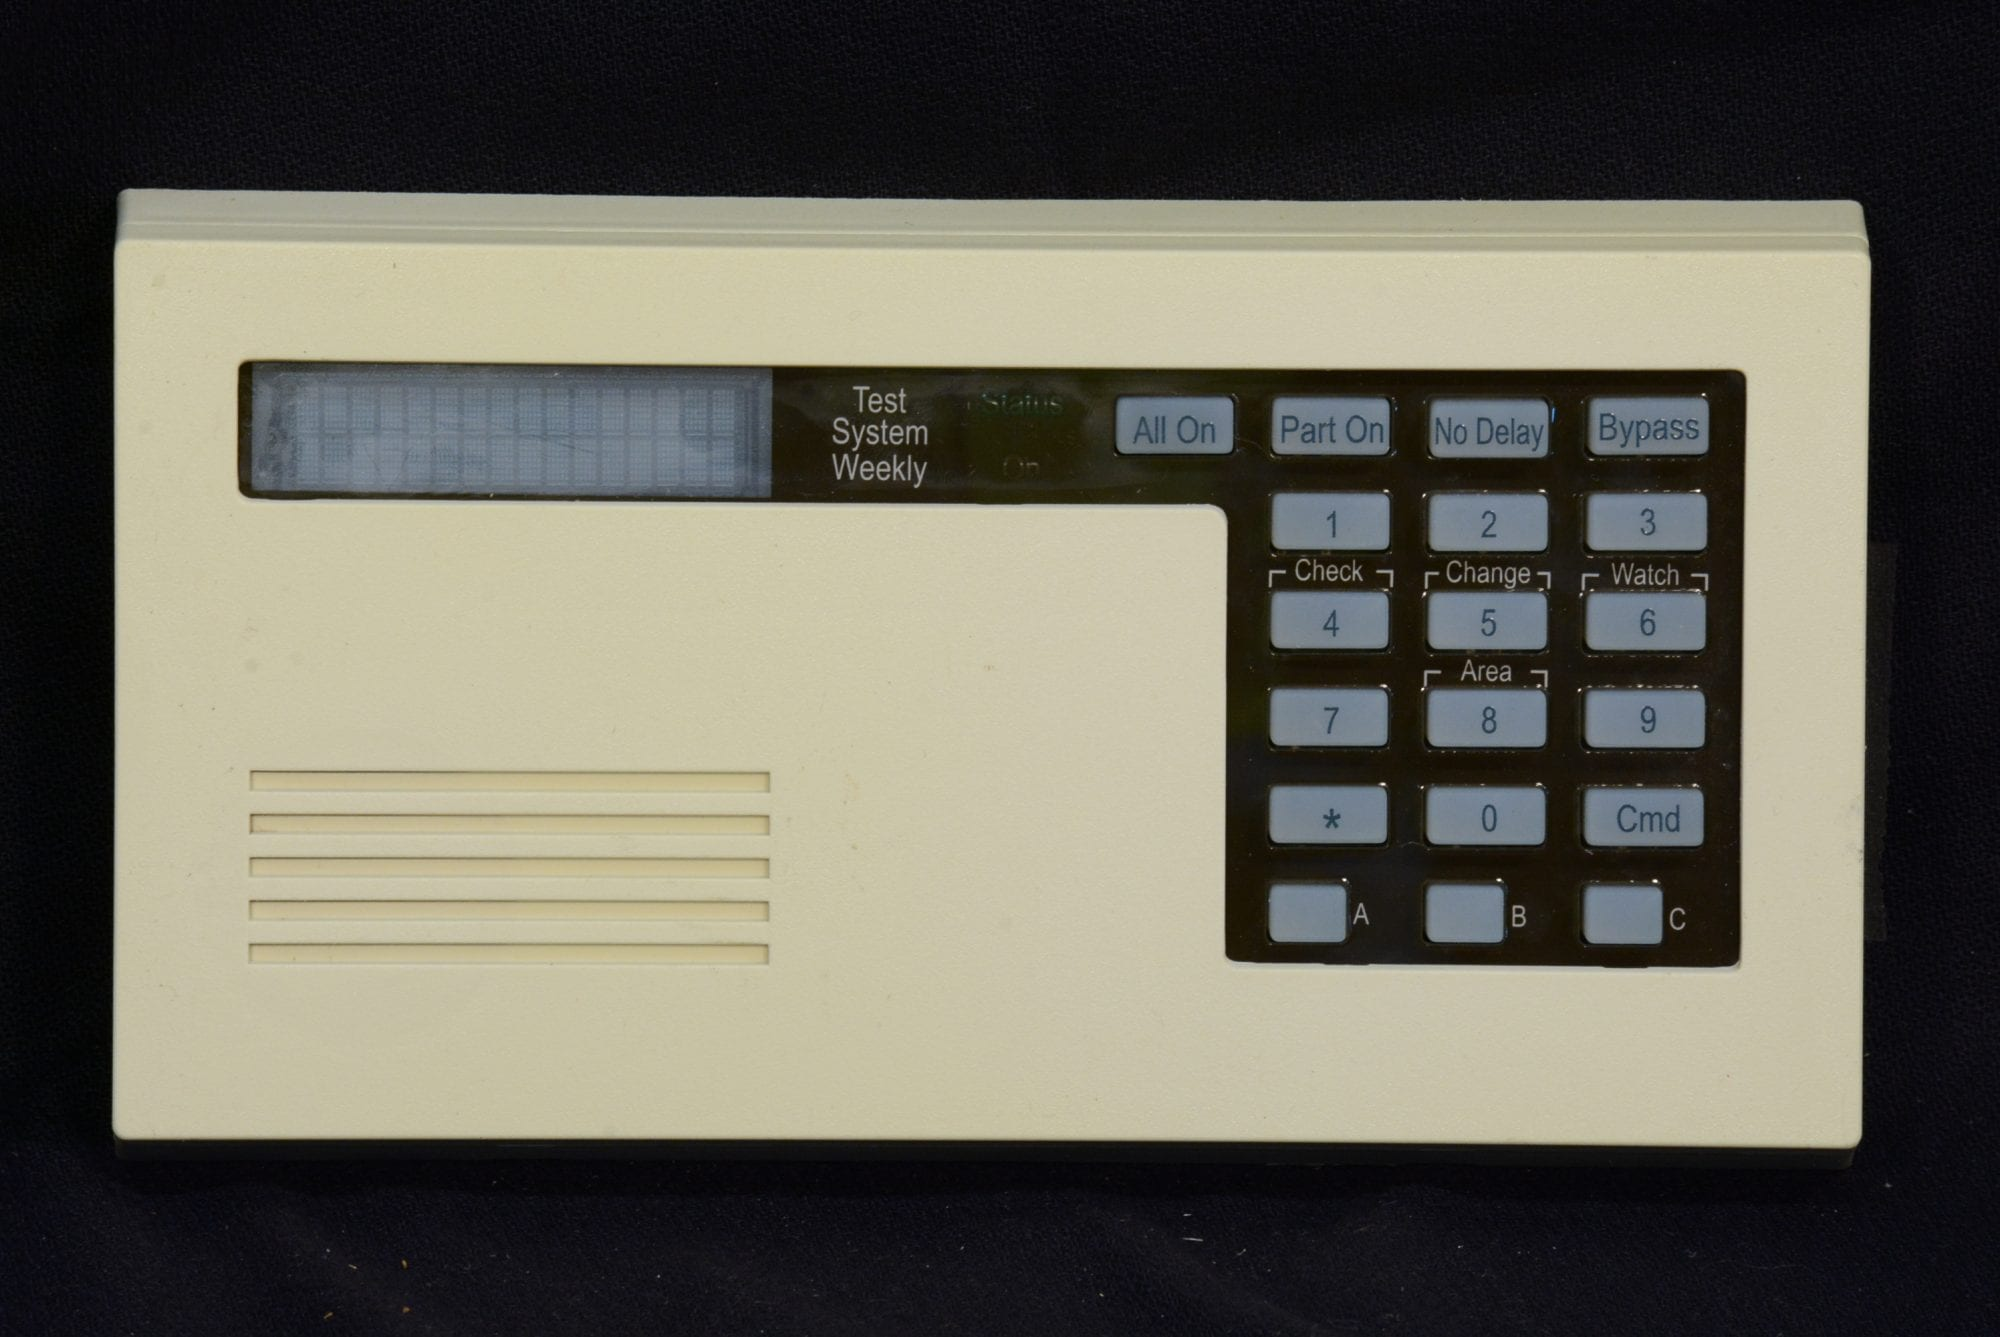 radionics keypad d625 wayne alarm systems rh waynealarm com GE Security System ADT Security System Manuals